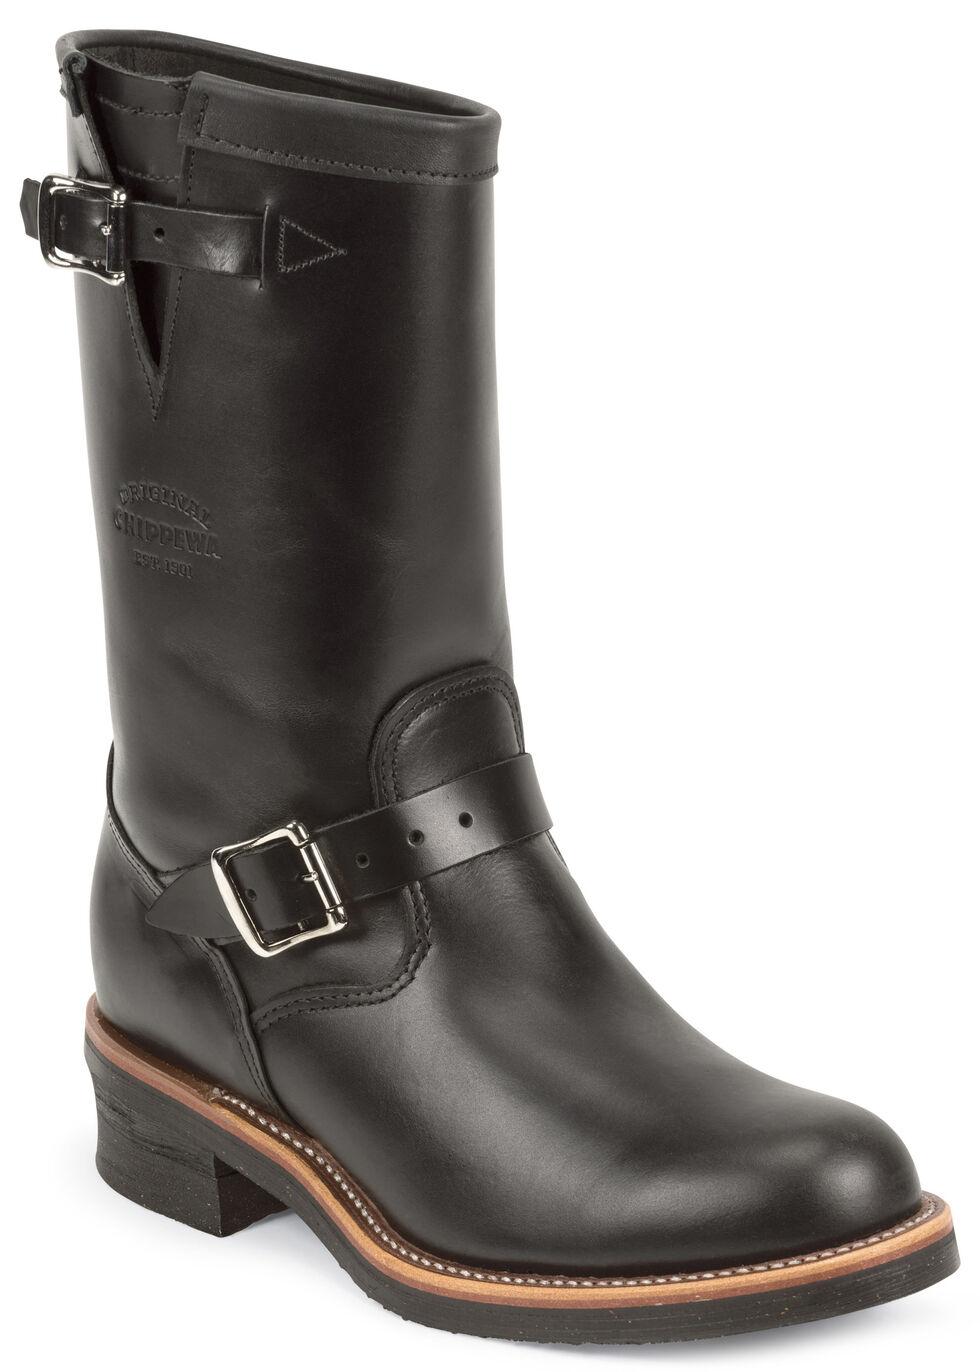 Chippewa Men's Whirlwind Black Engineer Boots - Round Toe, Black, hi-res